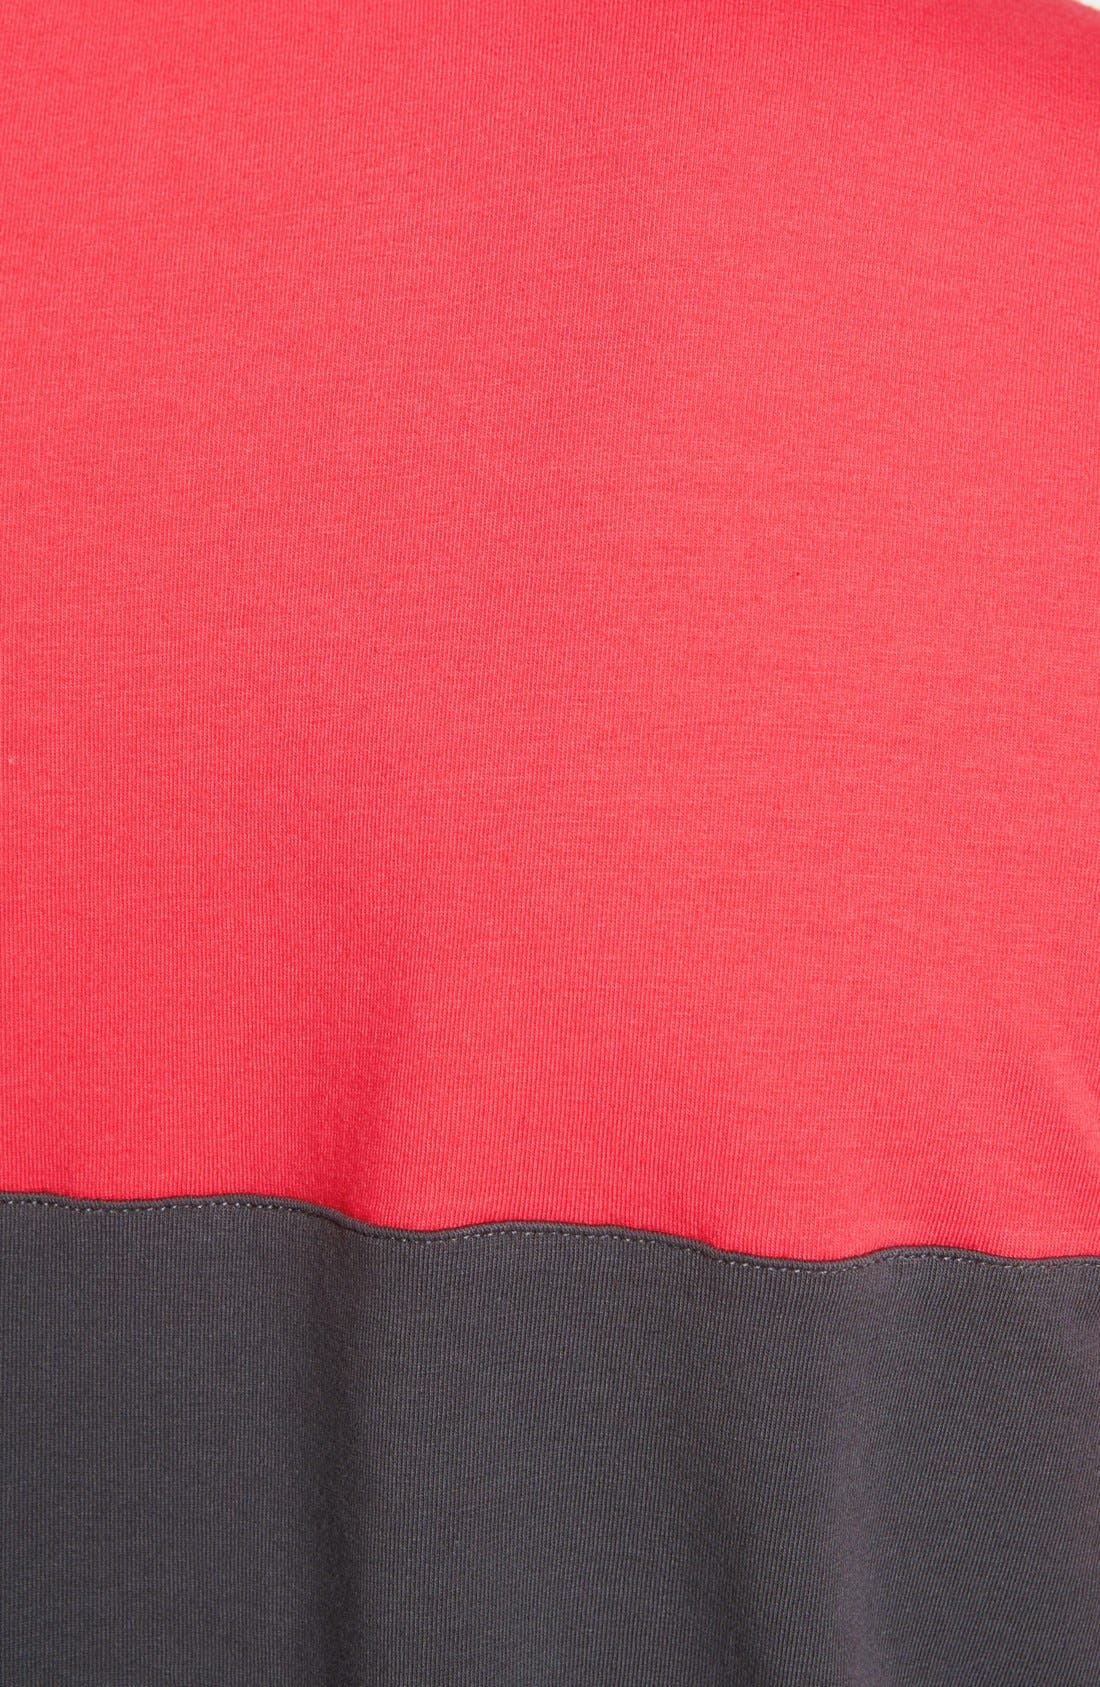 Alternate Image 3  - BOSS HUGO BOSS 'Innovation 4' T-Shirt